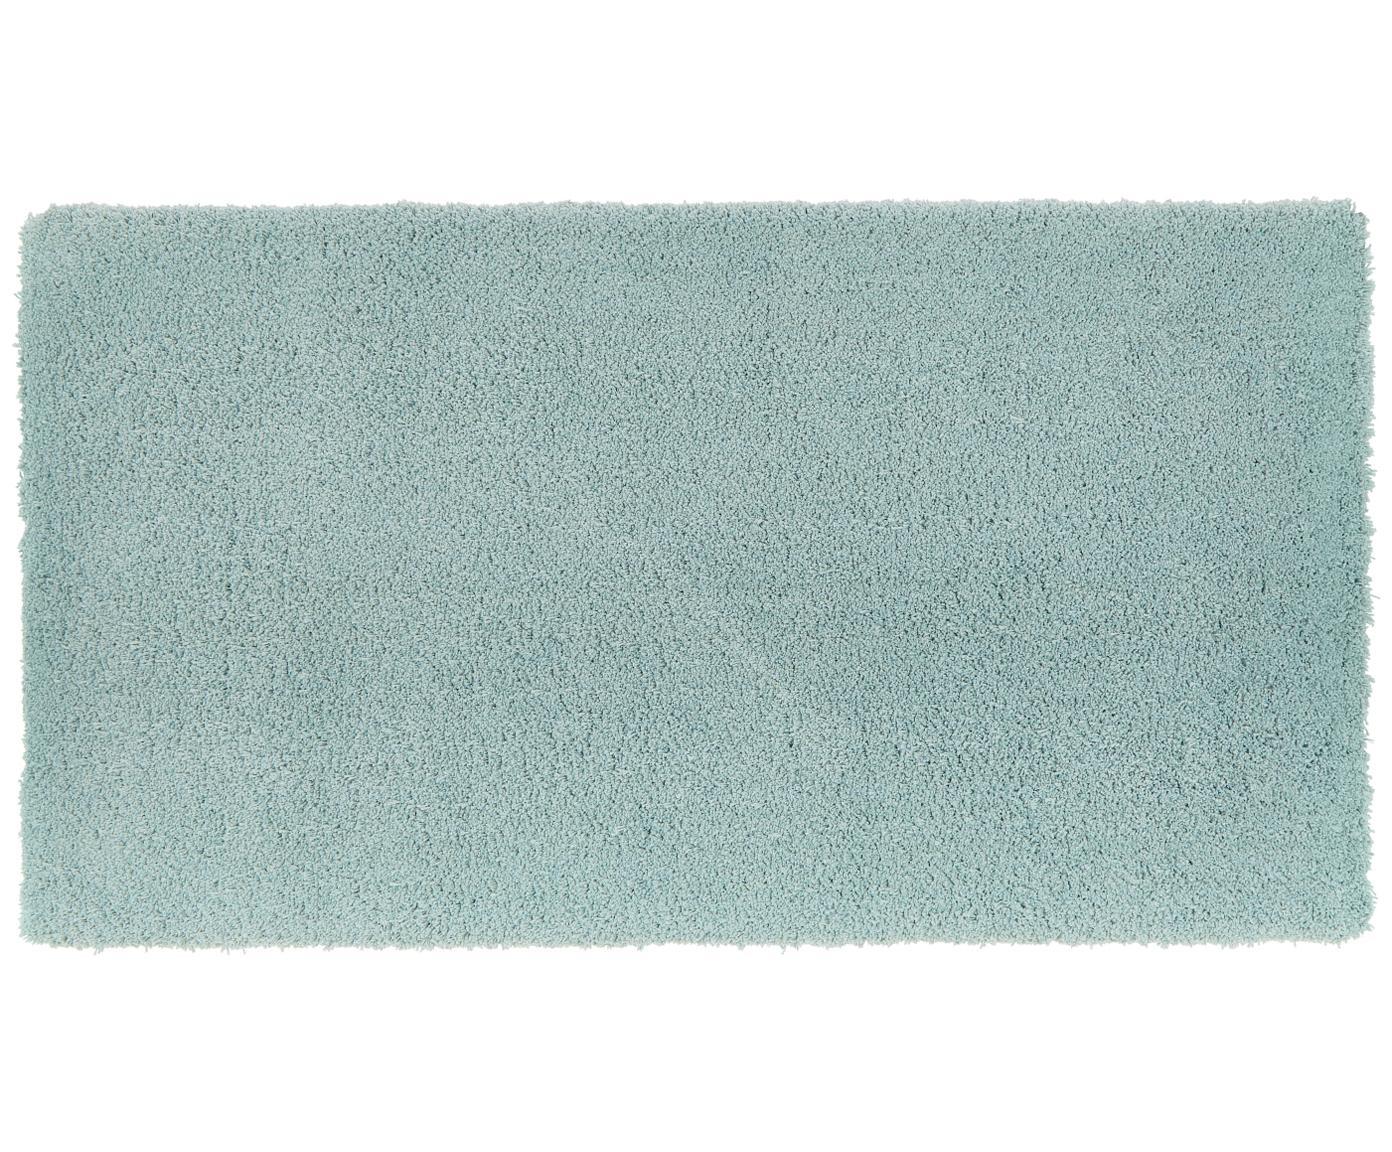 Tappeto peloso morbido verde menta Leighton, Retro: 100% poliestere, Verde menta, Larg. 80 x Lung. 150 cm (taglia XS)